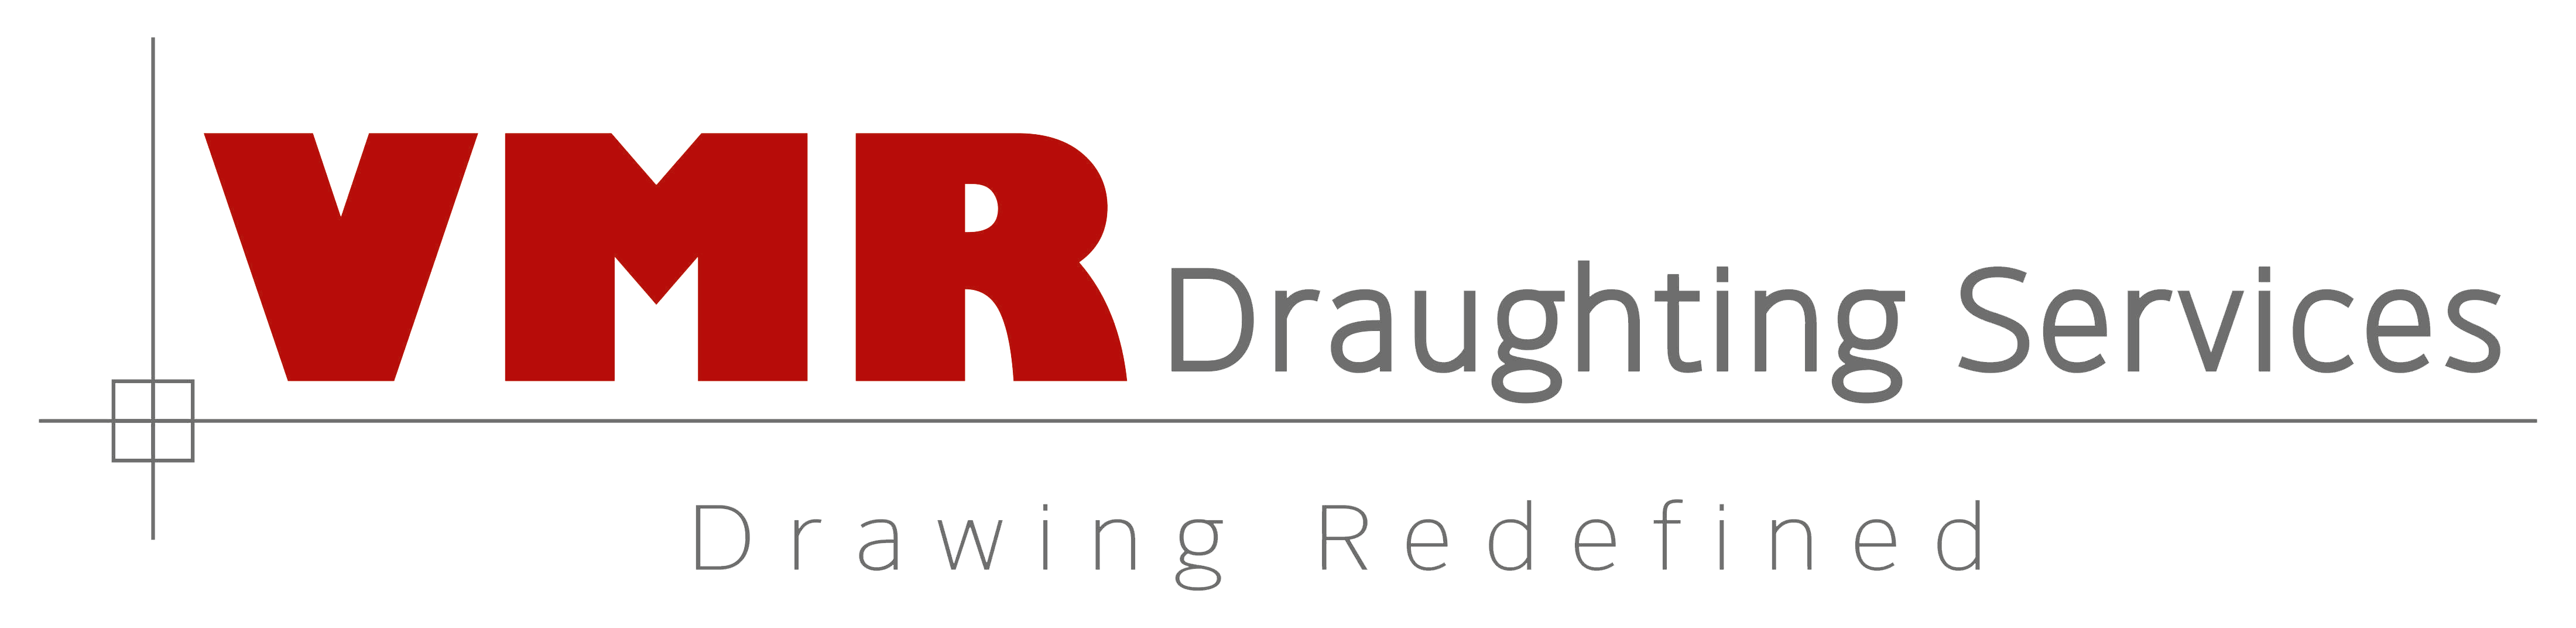 VMR-Draughting-Services-Logo